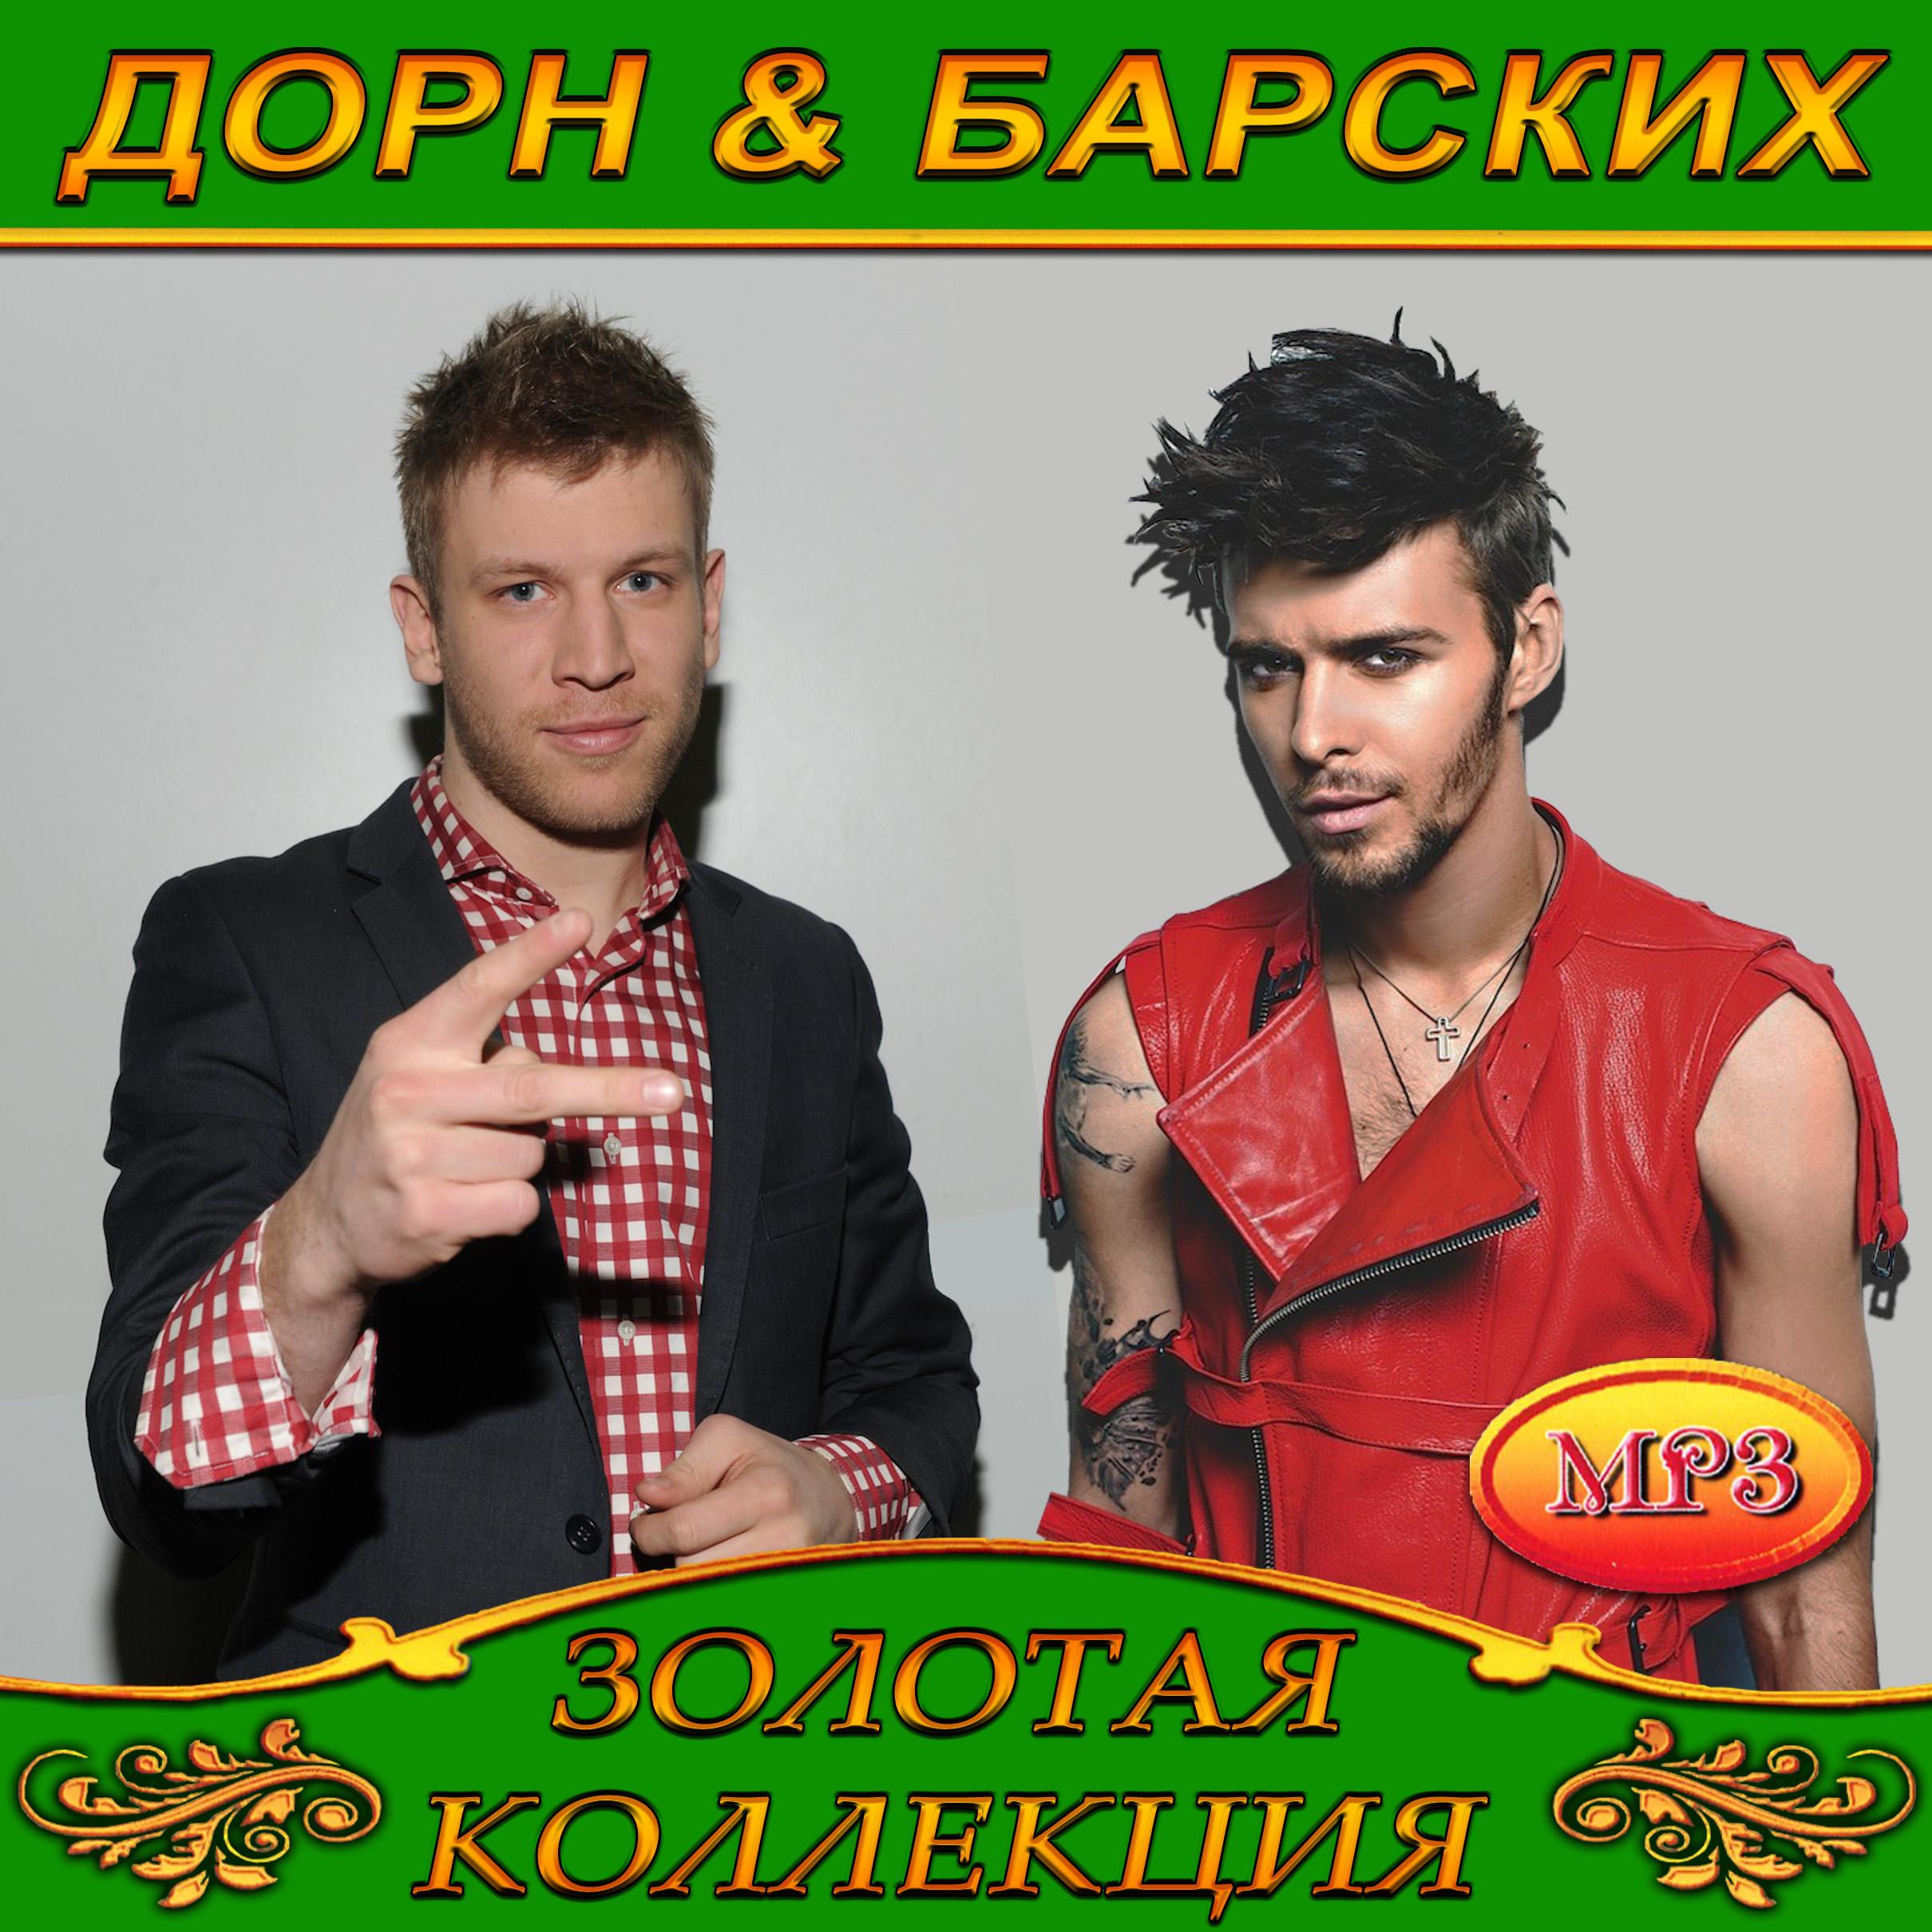 Иван Дорн & Макс Барских [mp3]